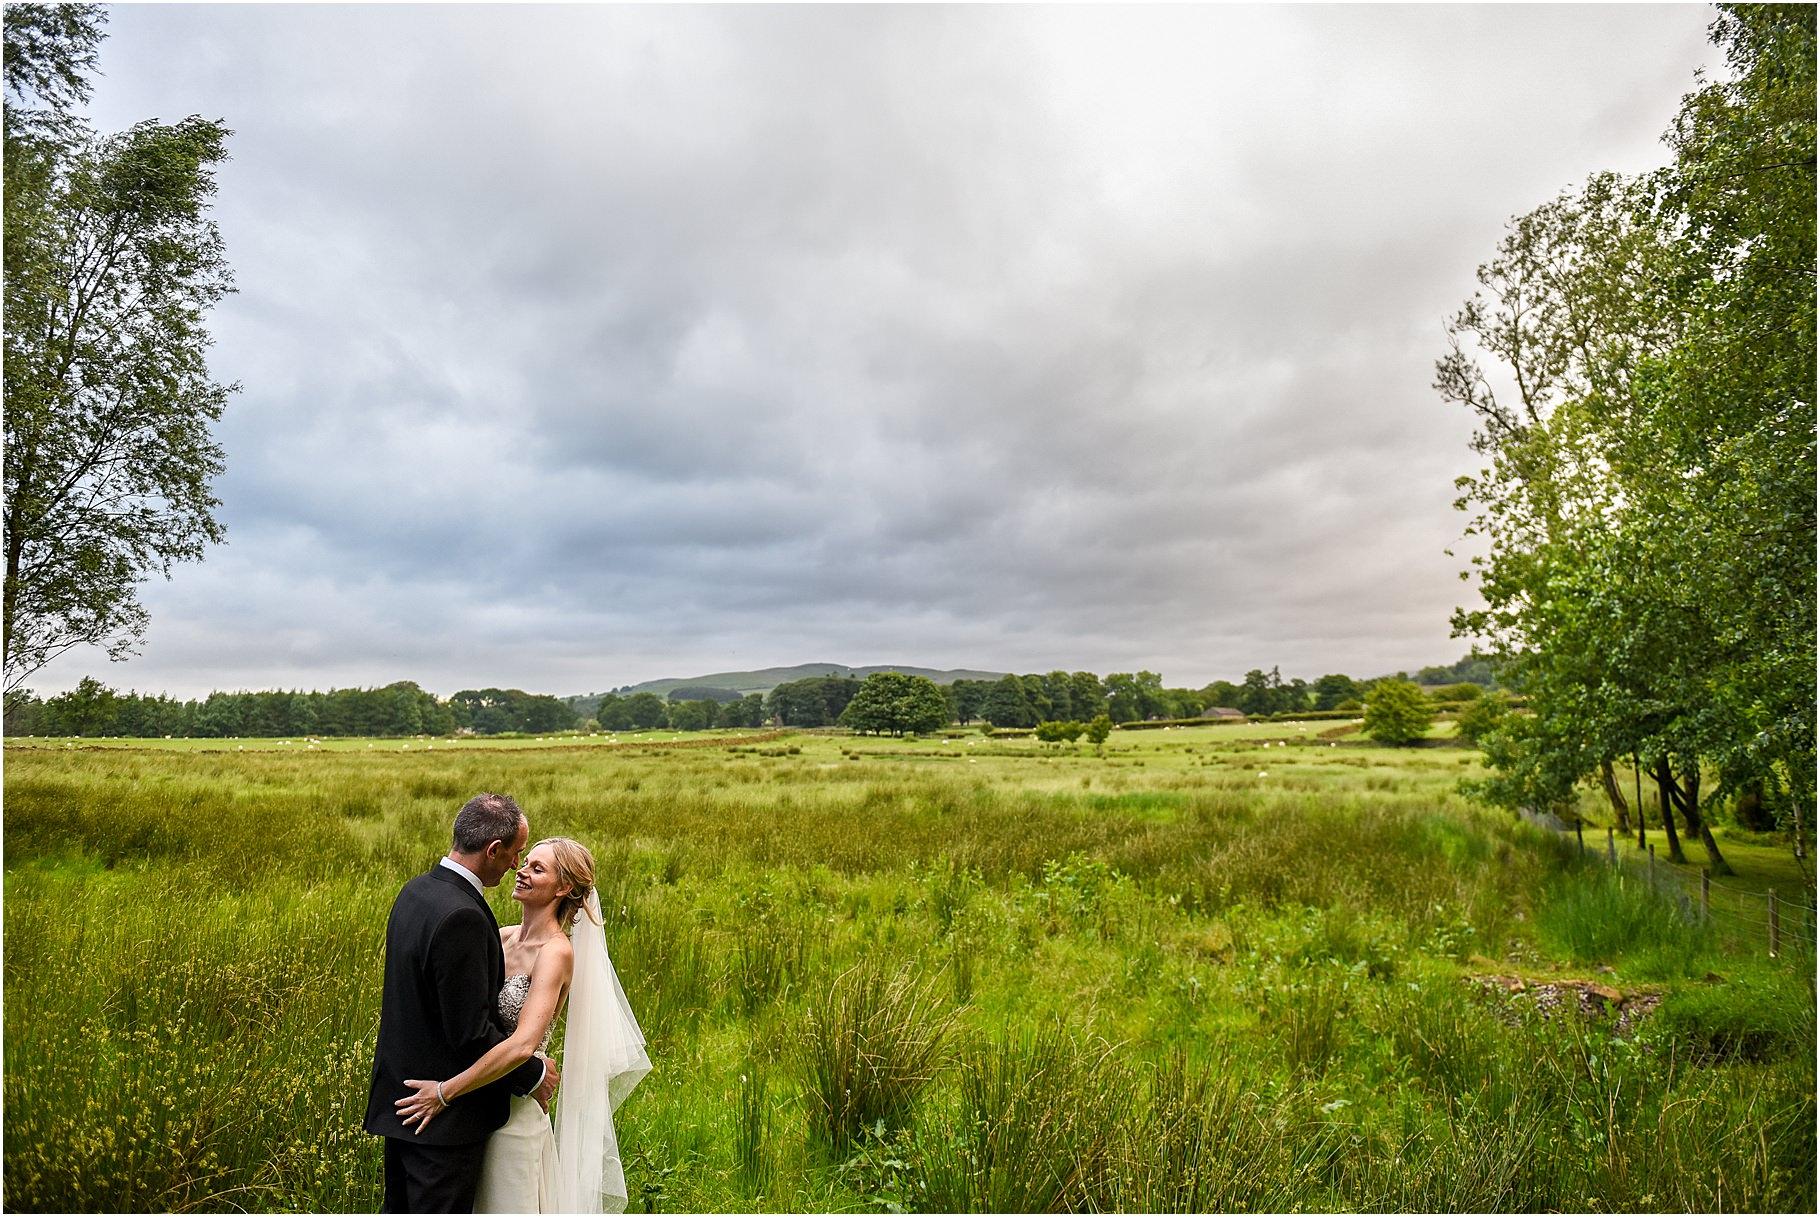 dan-wootton-photography-2017-weddings-178.jpg